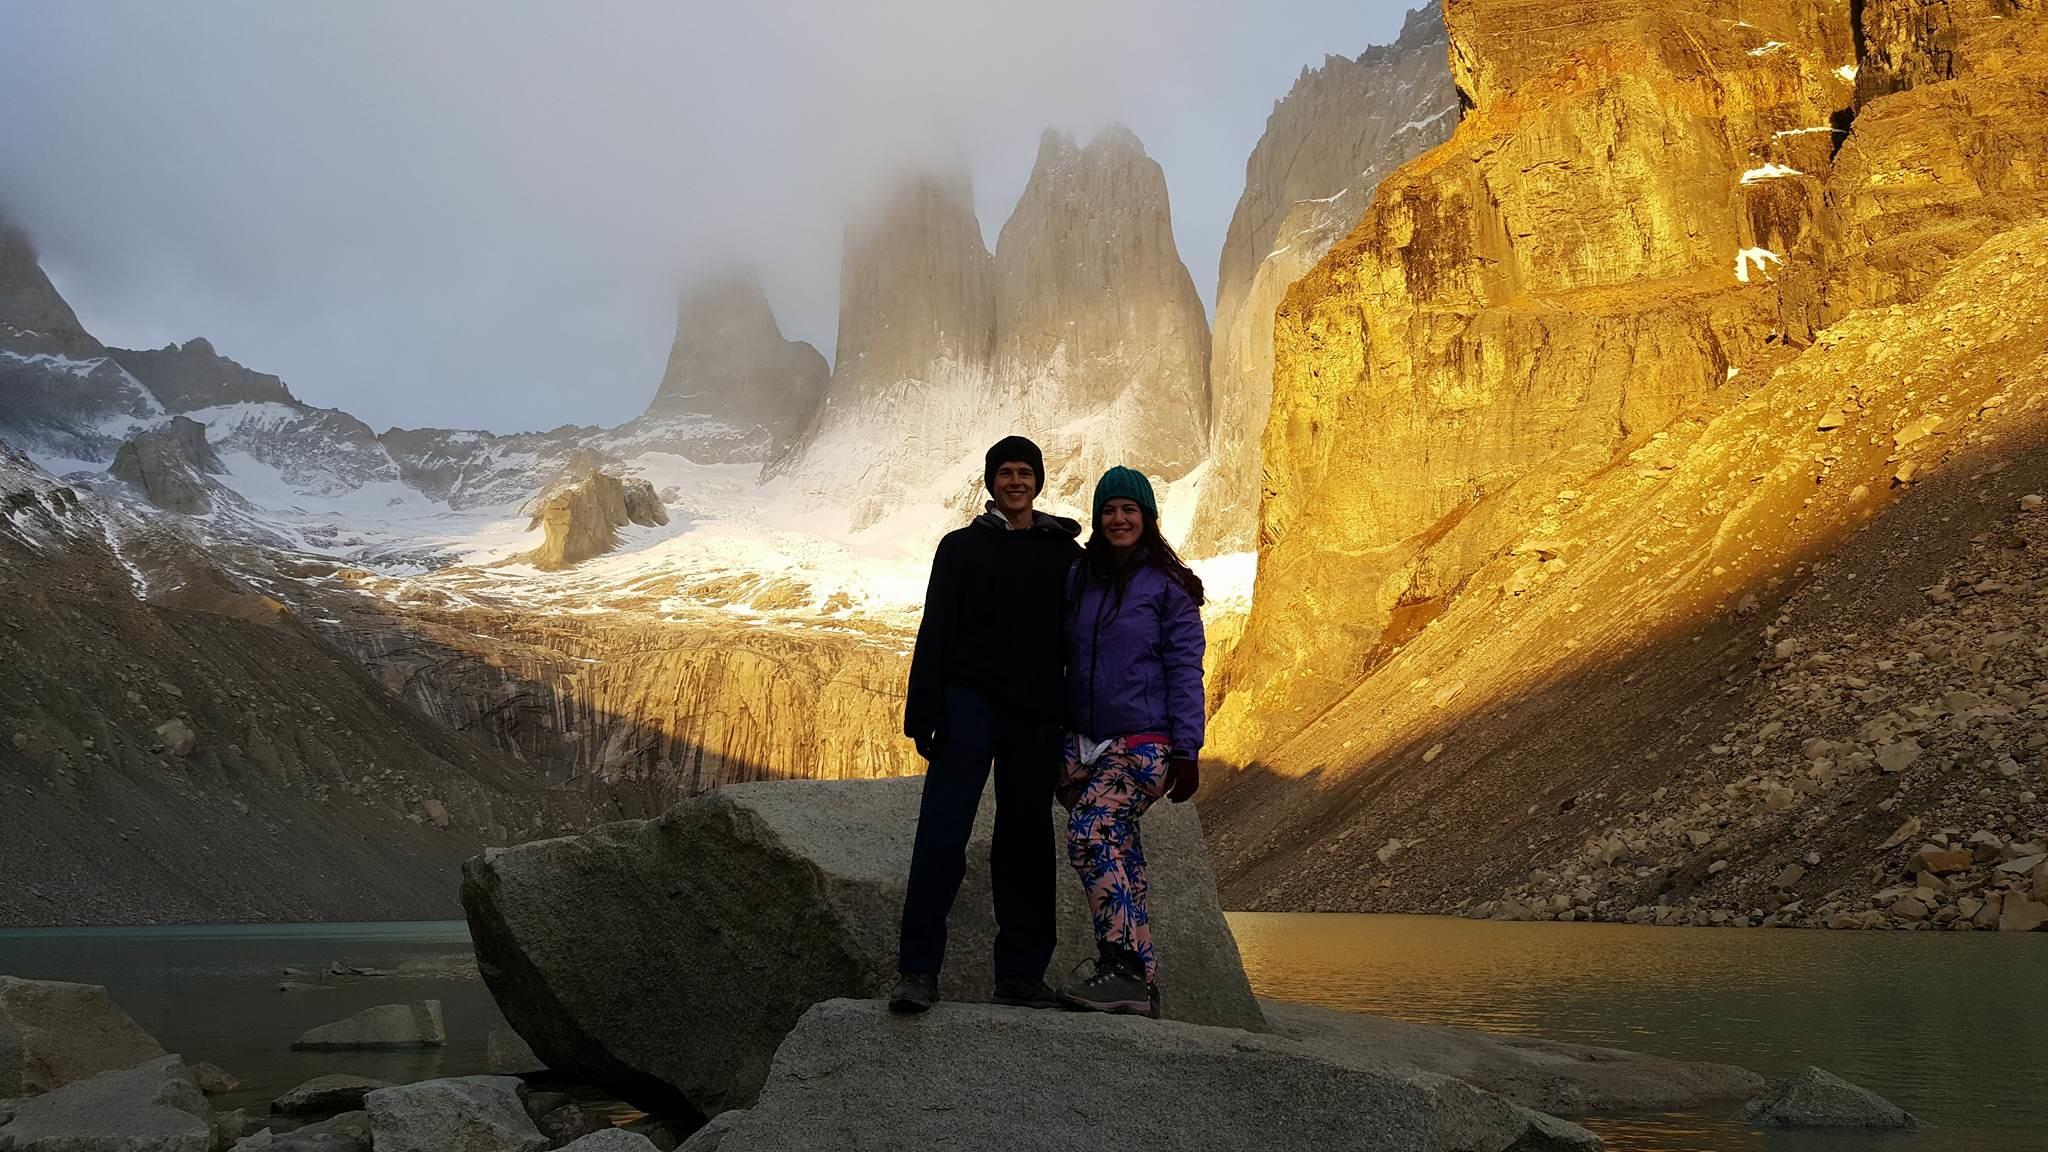 Sunrise at torres del paine national park